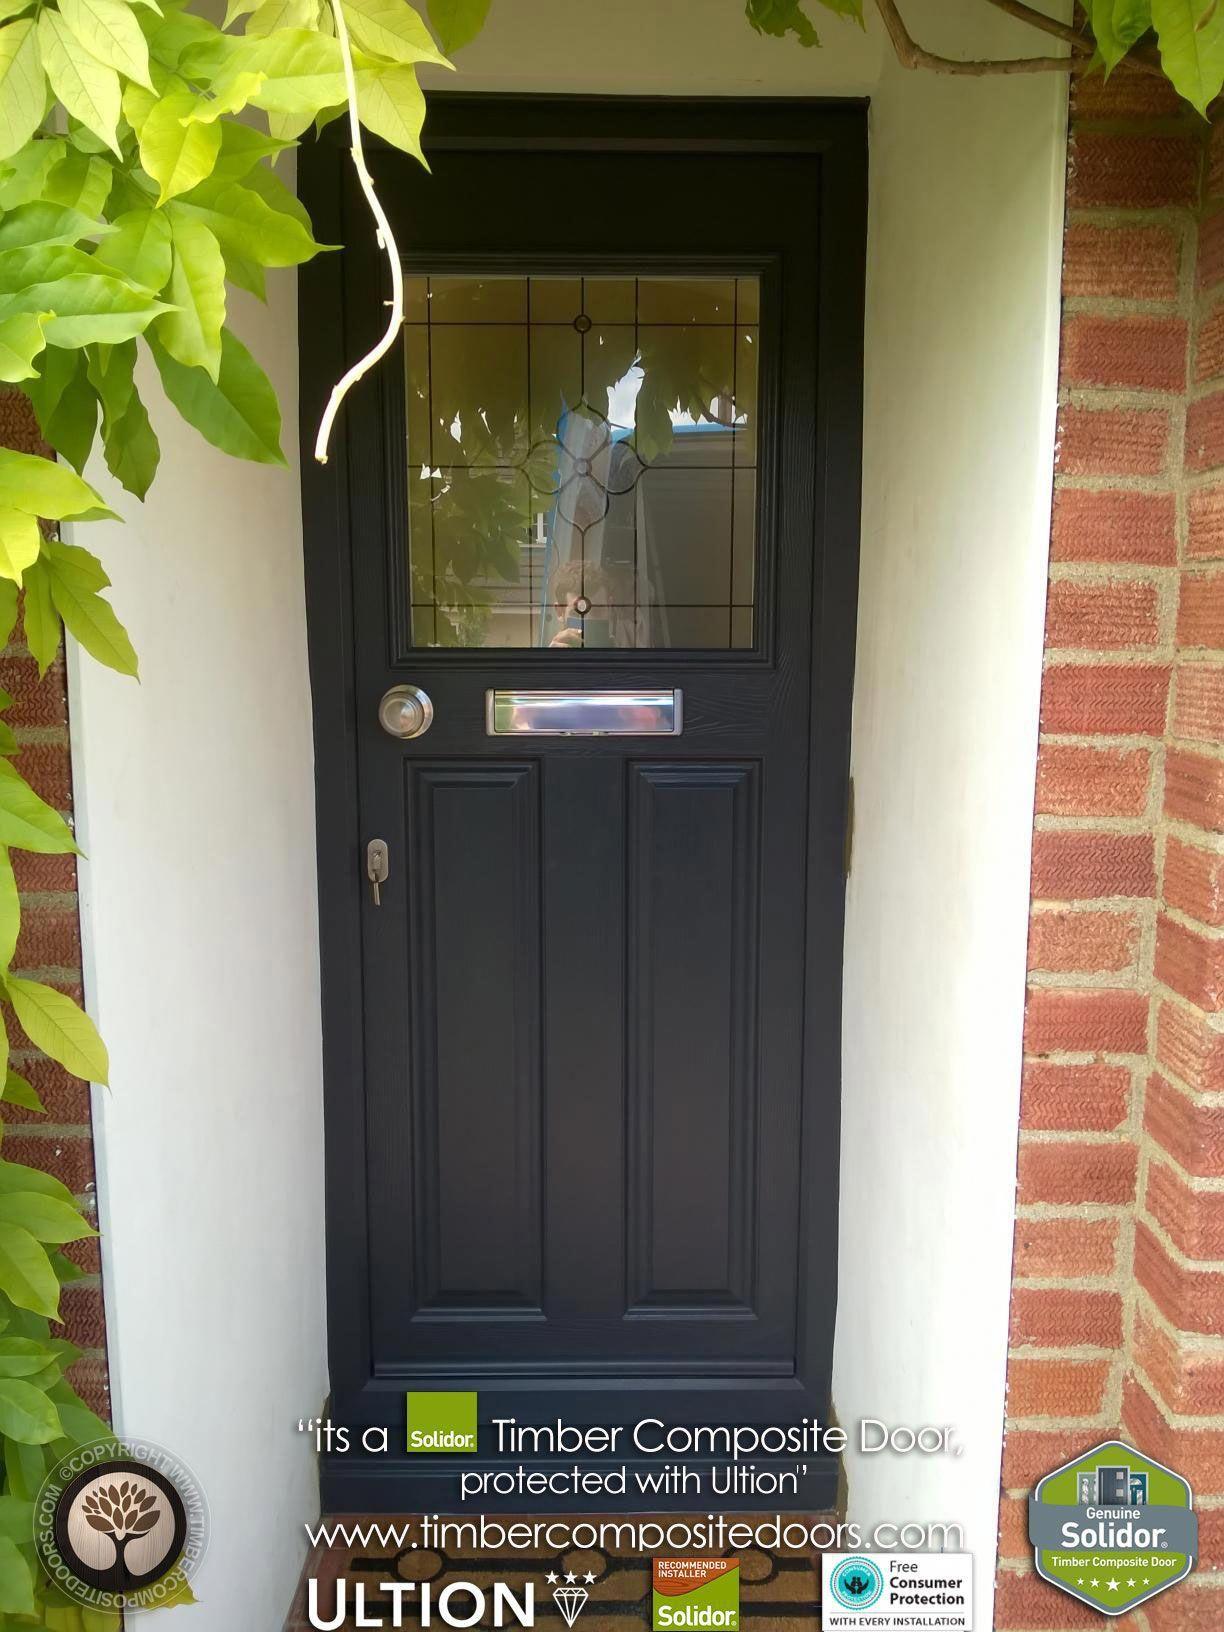 Black 1930s Solidor Timber Composite Door With Ultion Lock Frontdoor Composite Front Door Front Door Design Facade House